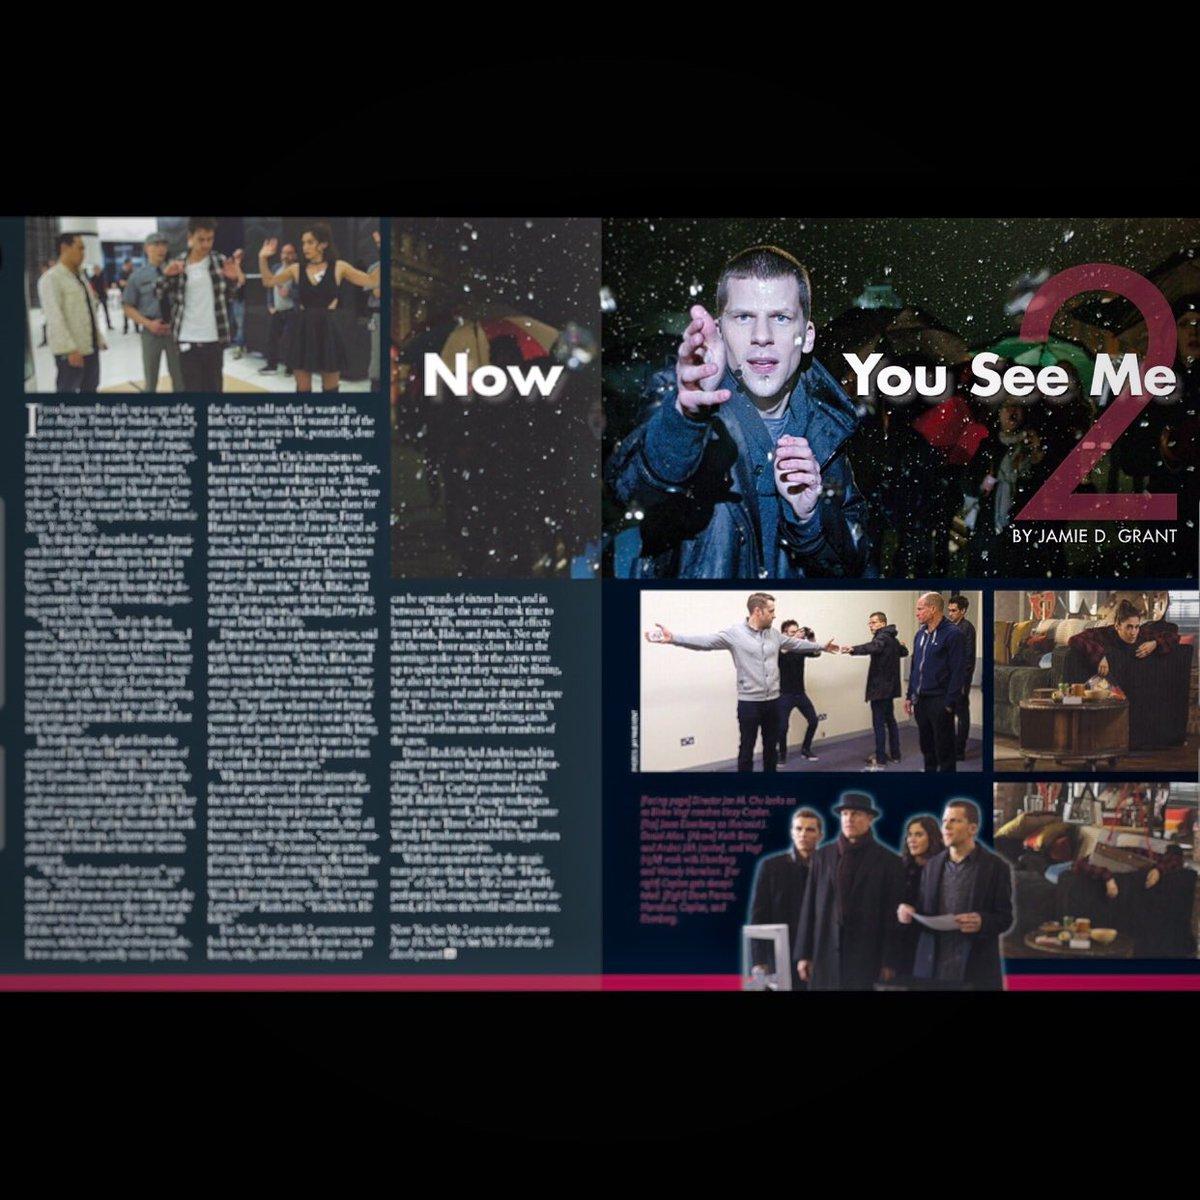 In June's @MAGICmagazine read about @jonmchu @KeithpBarry @BlakeVogtMagic @andreijikh & #NYSM2 ! https://t.co/vViU1t043Y